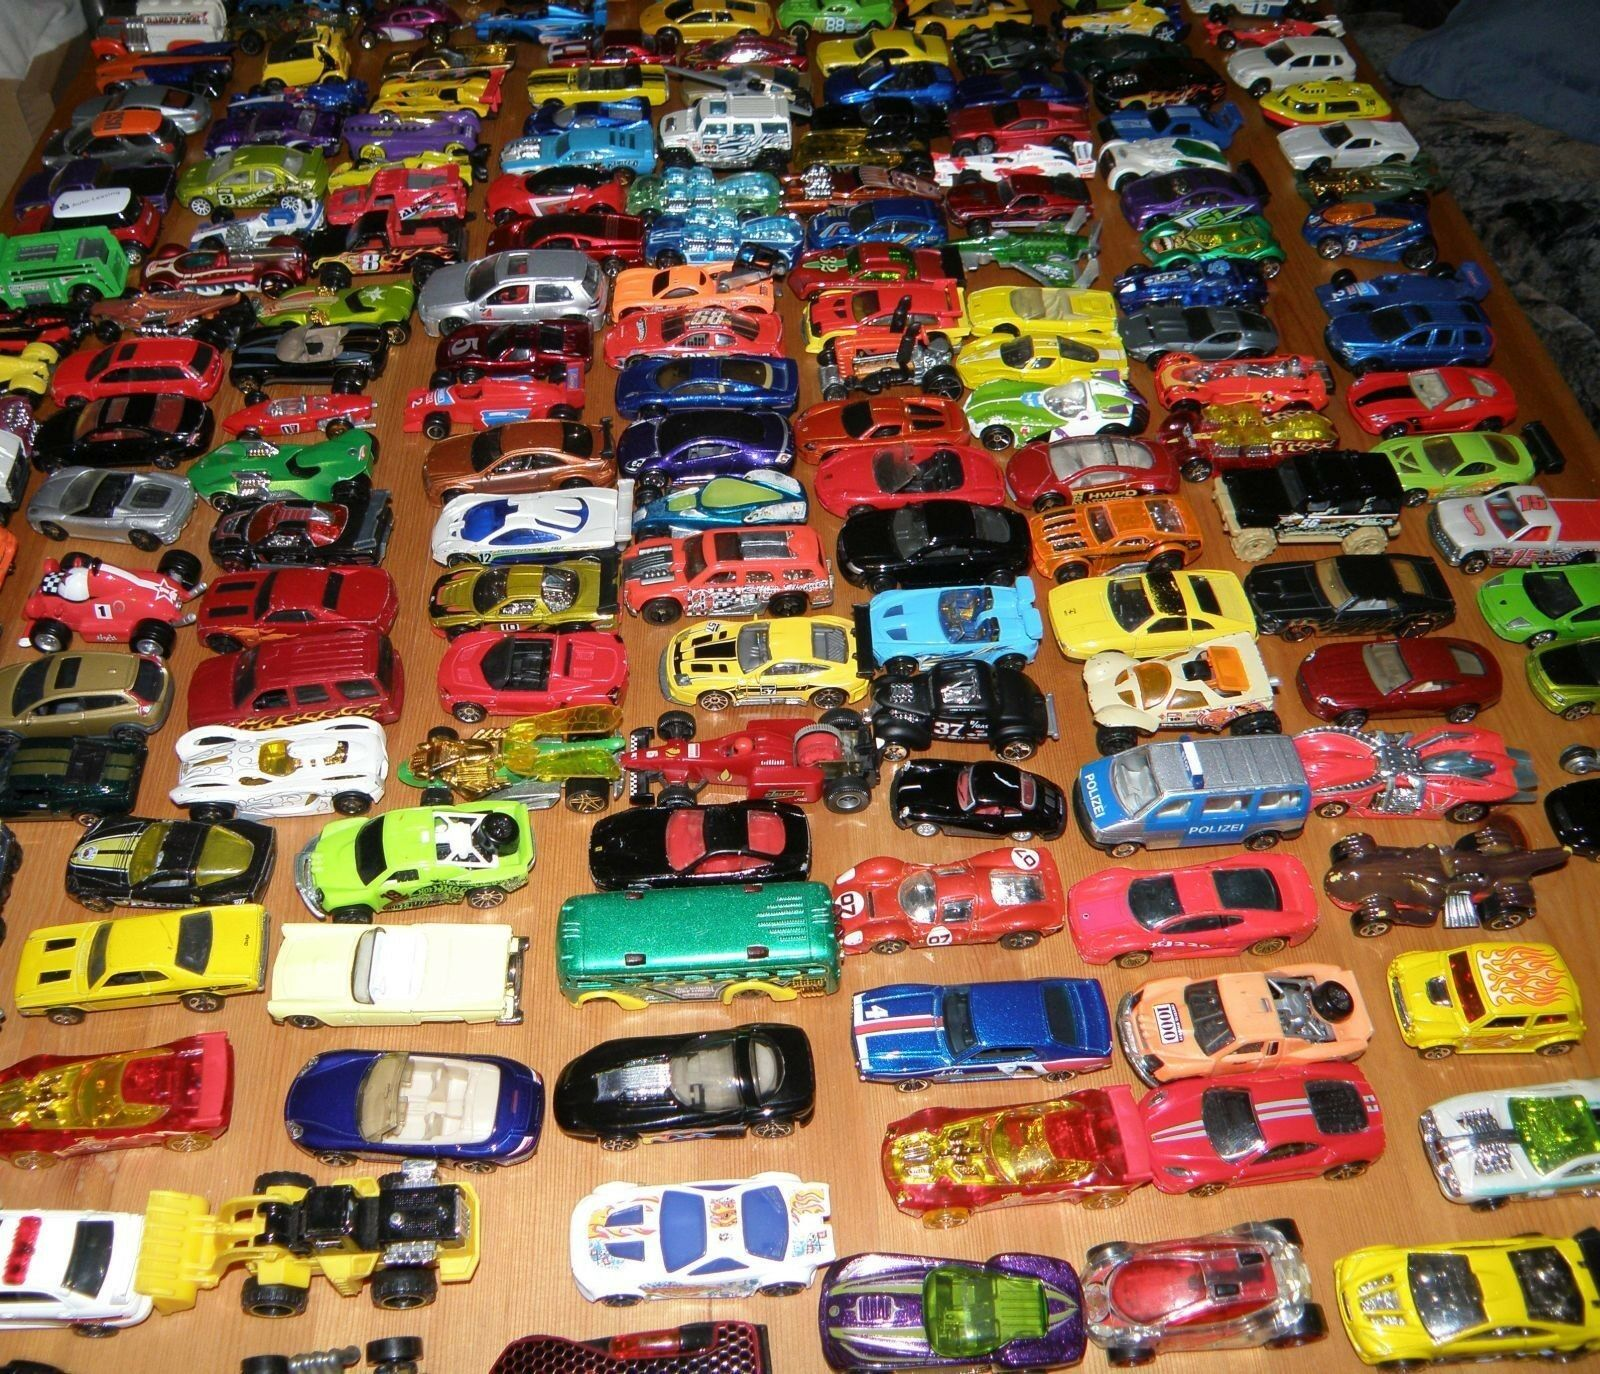 75 Spielzeugautos Autos Hot Wheels Matchbox Welly Majorette Siku Guter Zustand! Autos